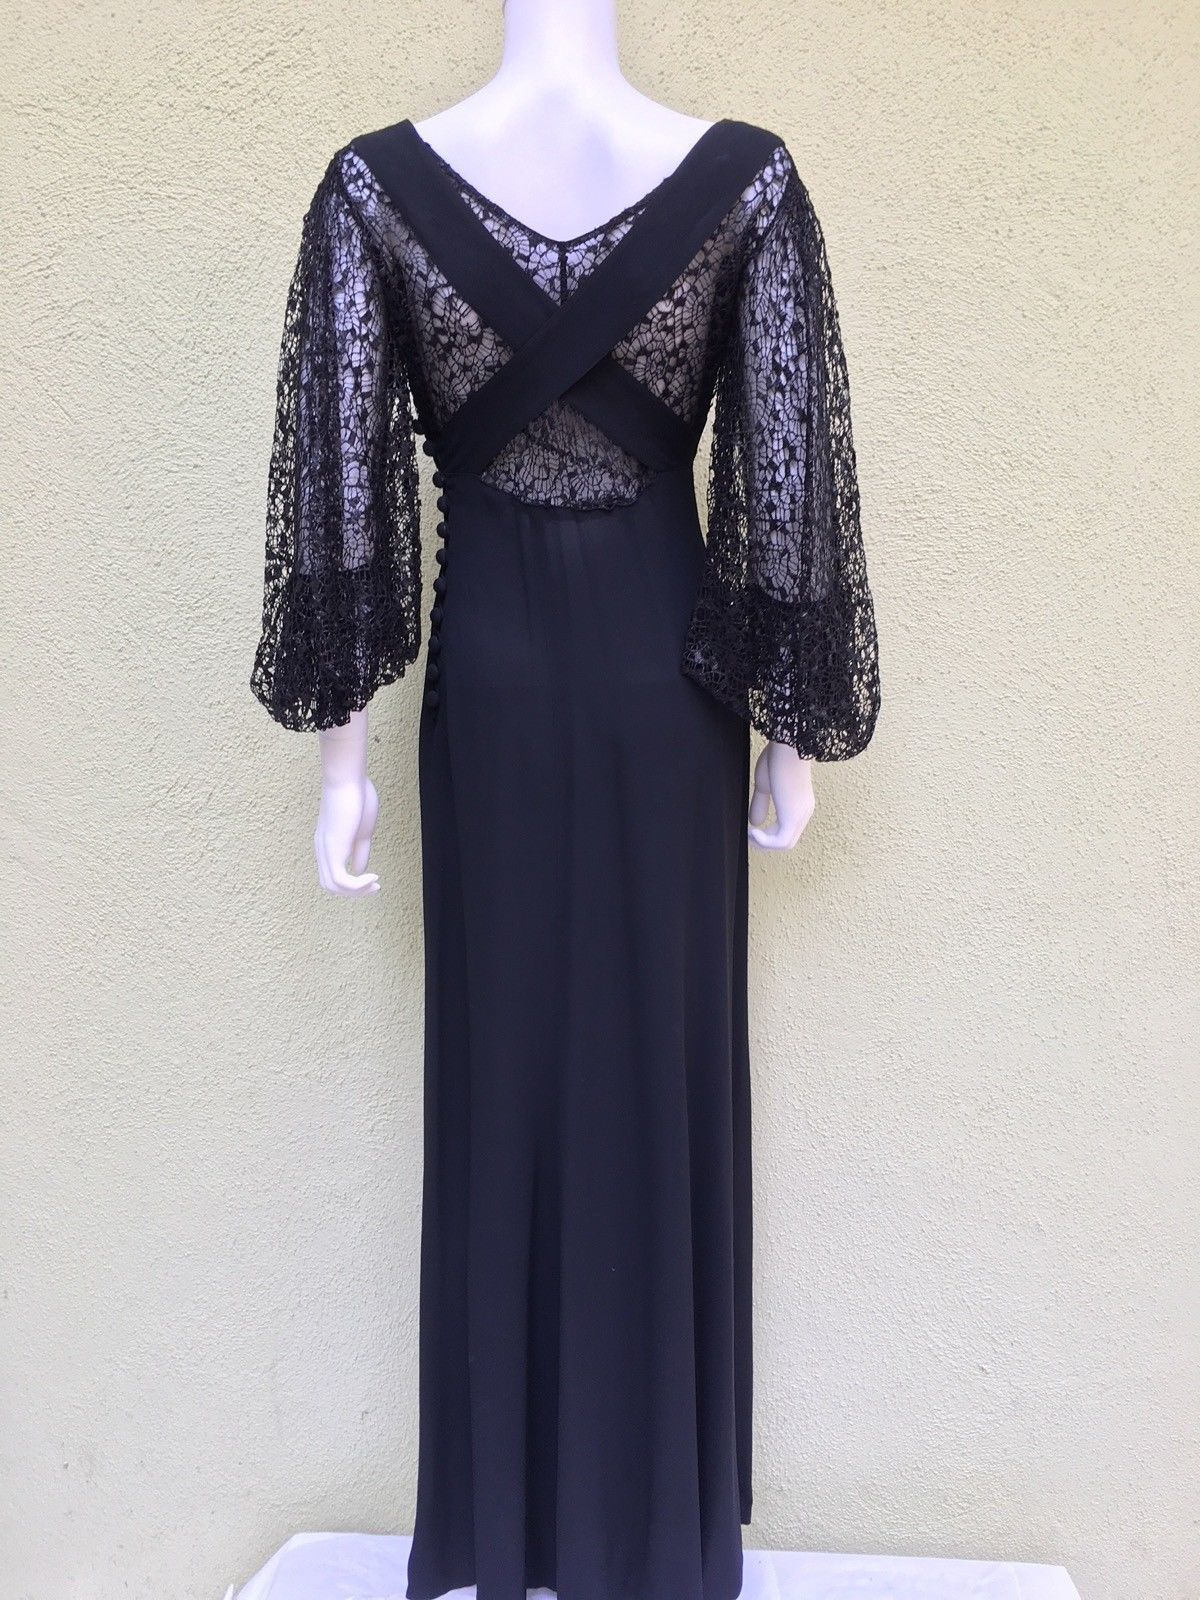 Original Lettie Lee 1930 S Evening Dress Ebay Vintage Fashion 1930s Dresses Vintage Fashion